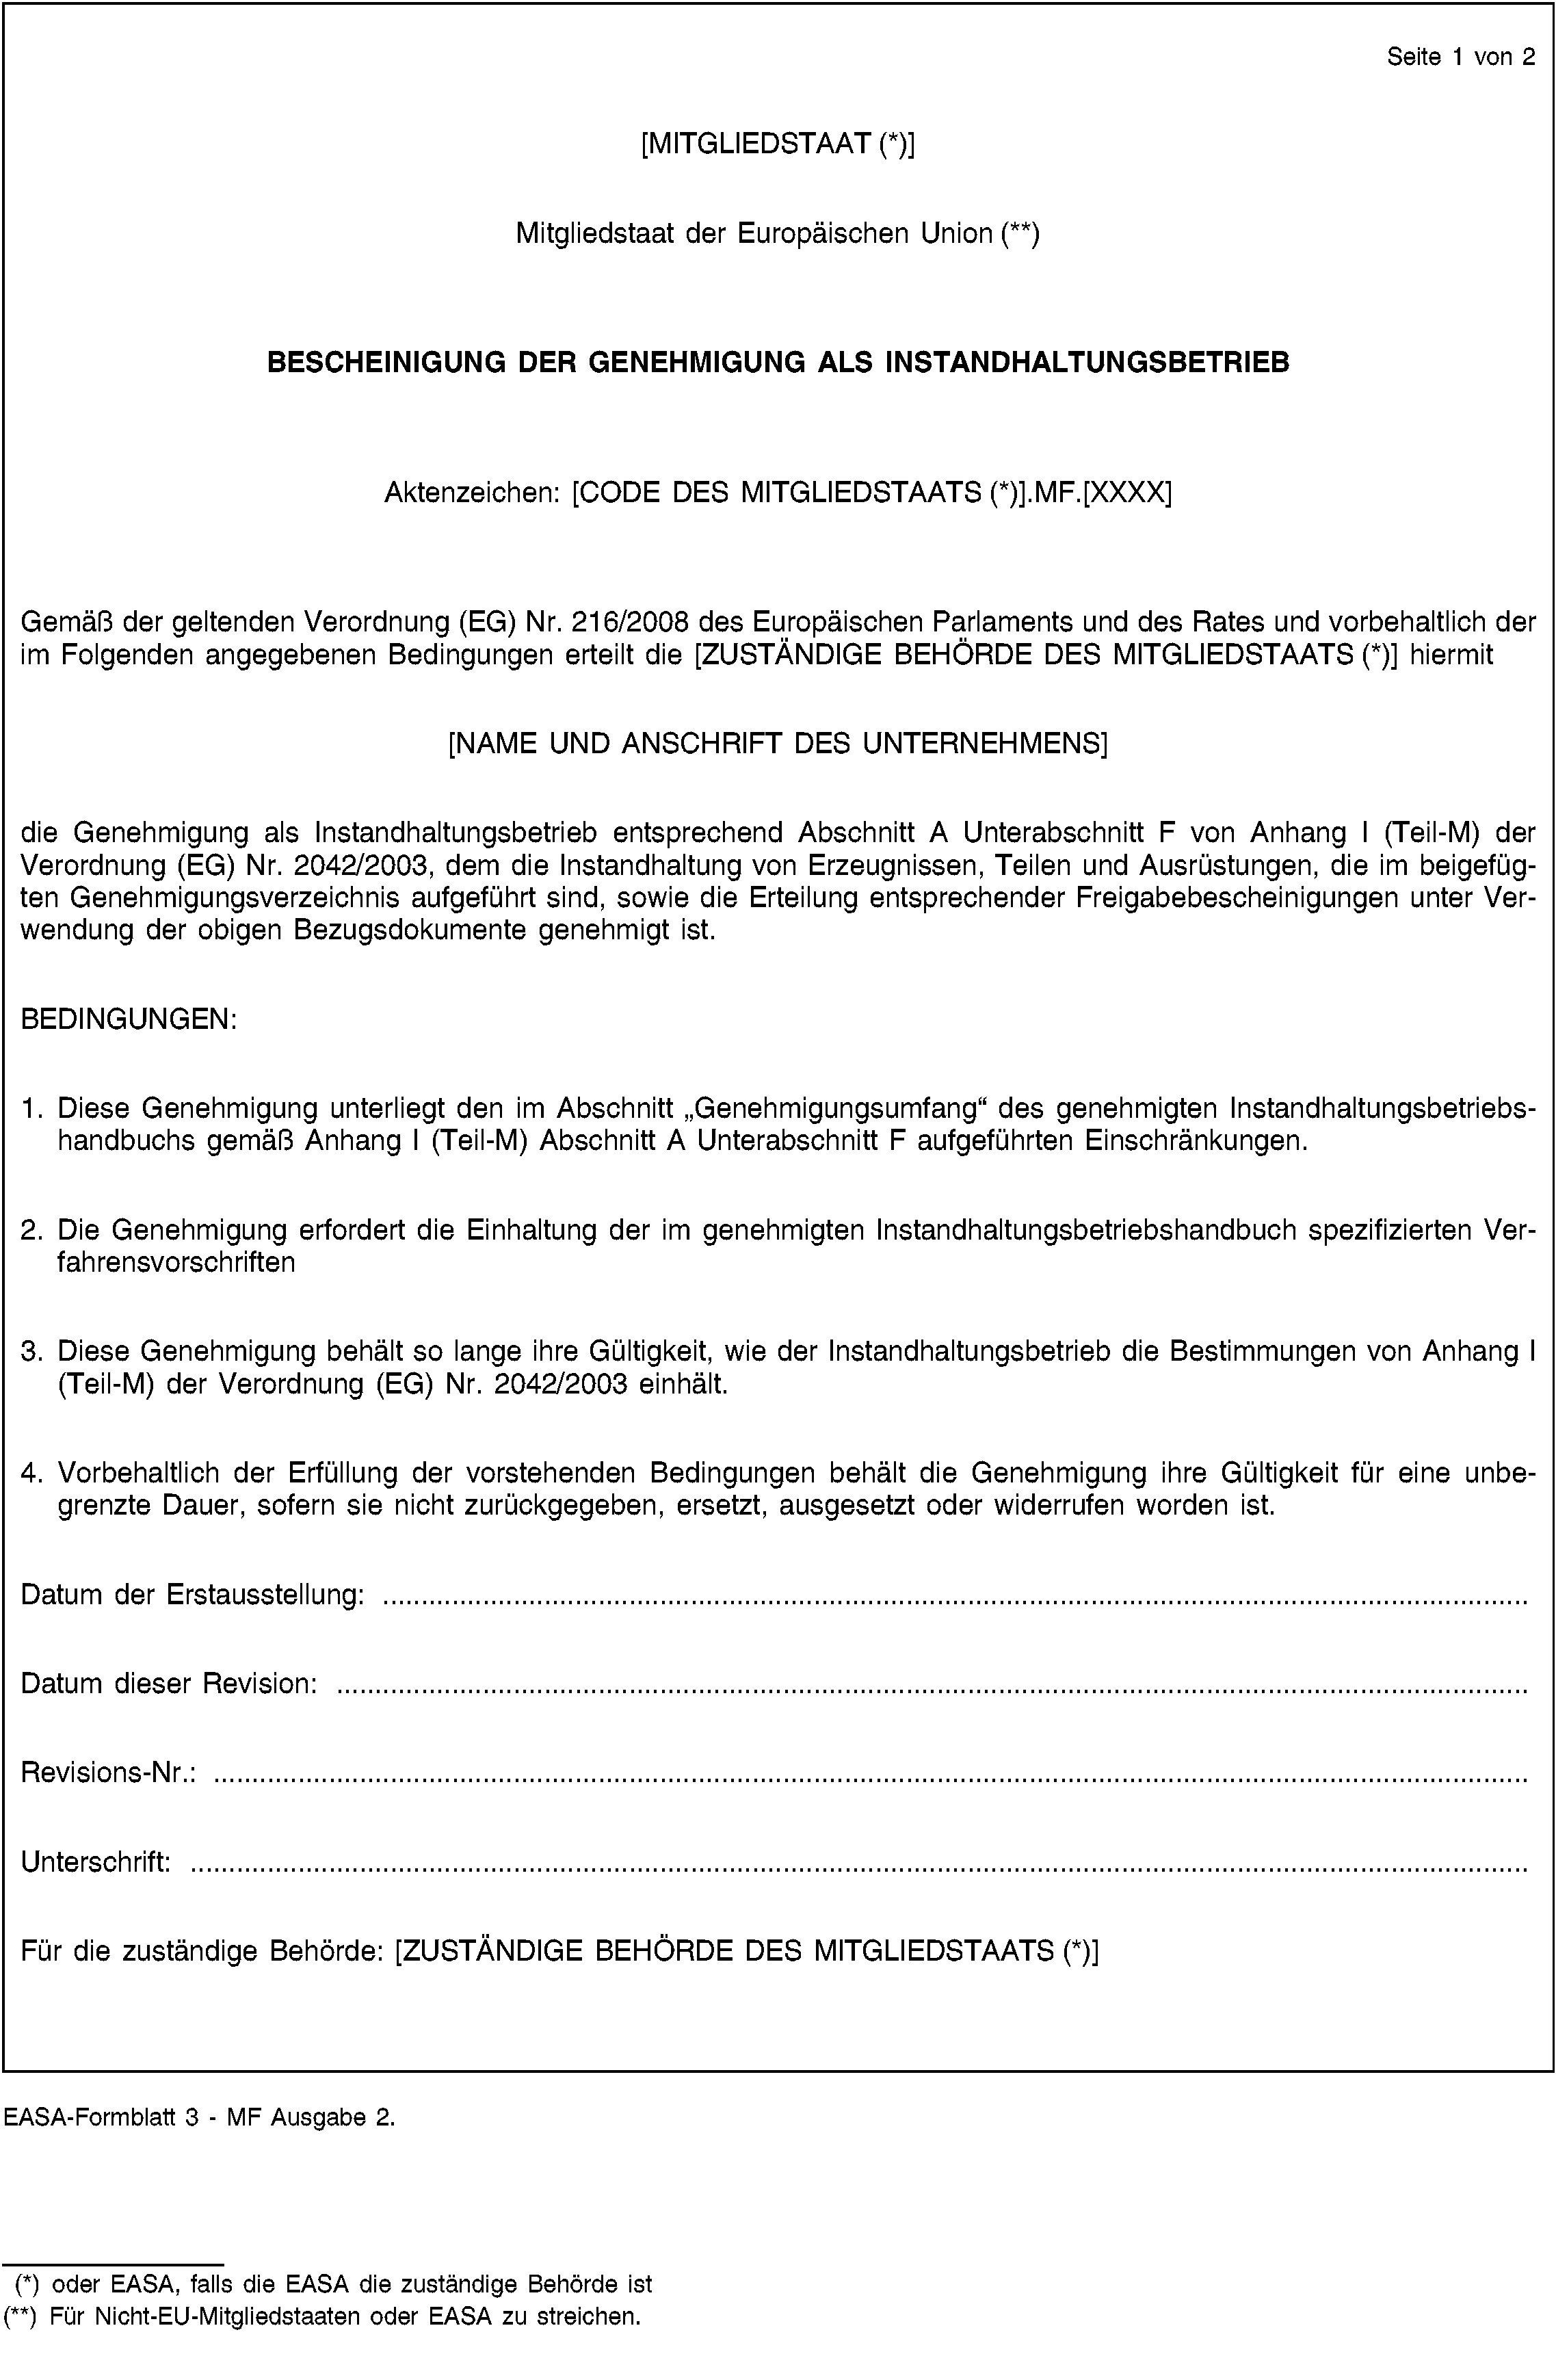 EUR-Lex - 02003R2042-20111117 - EN - EUR-Lex